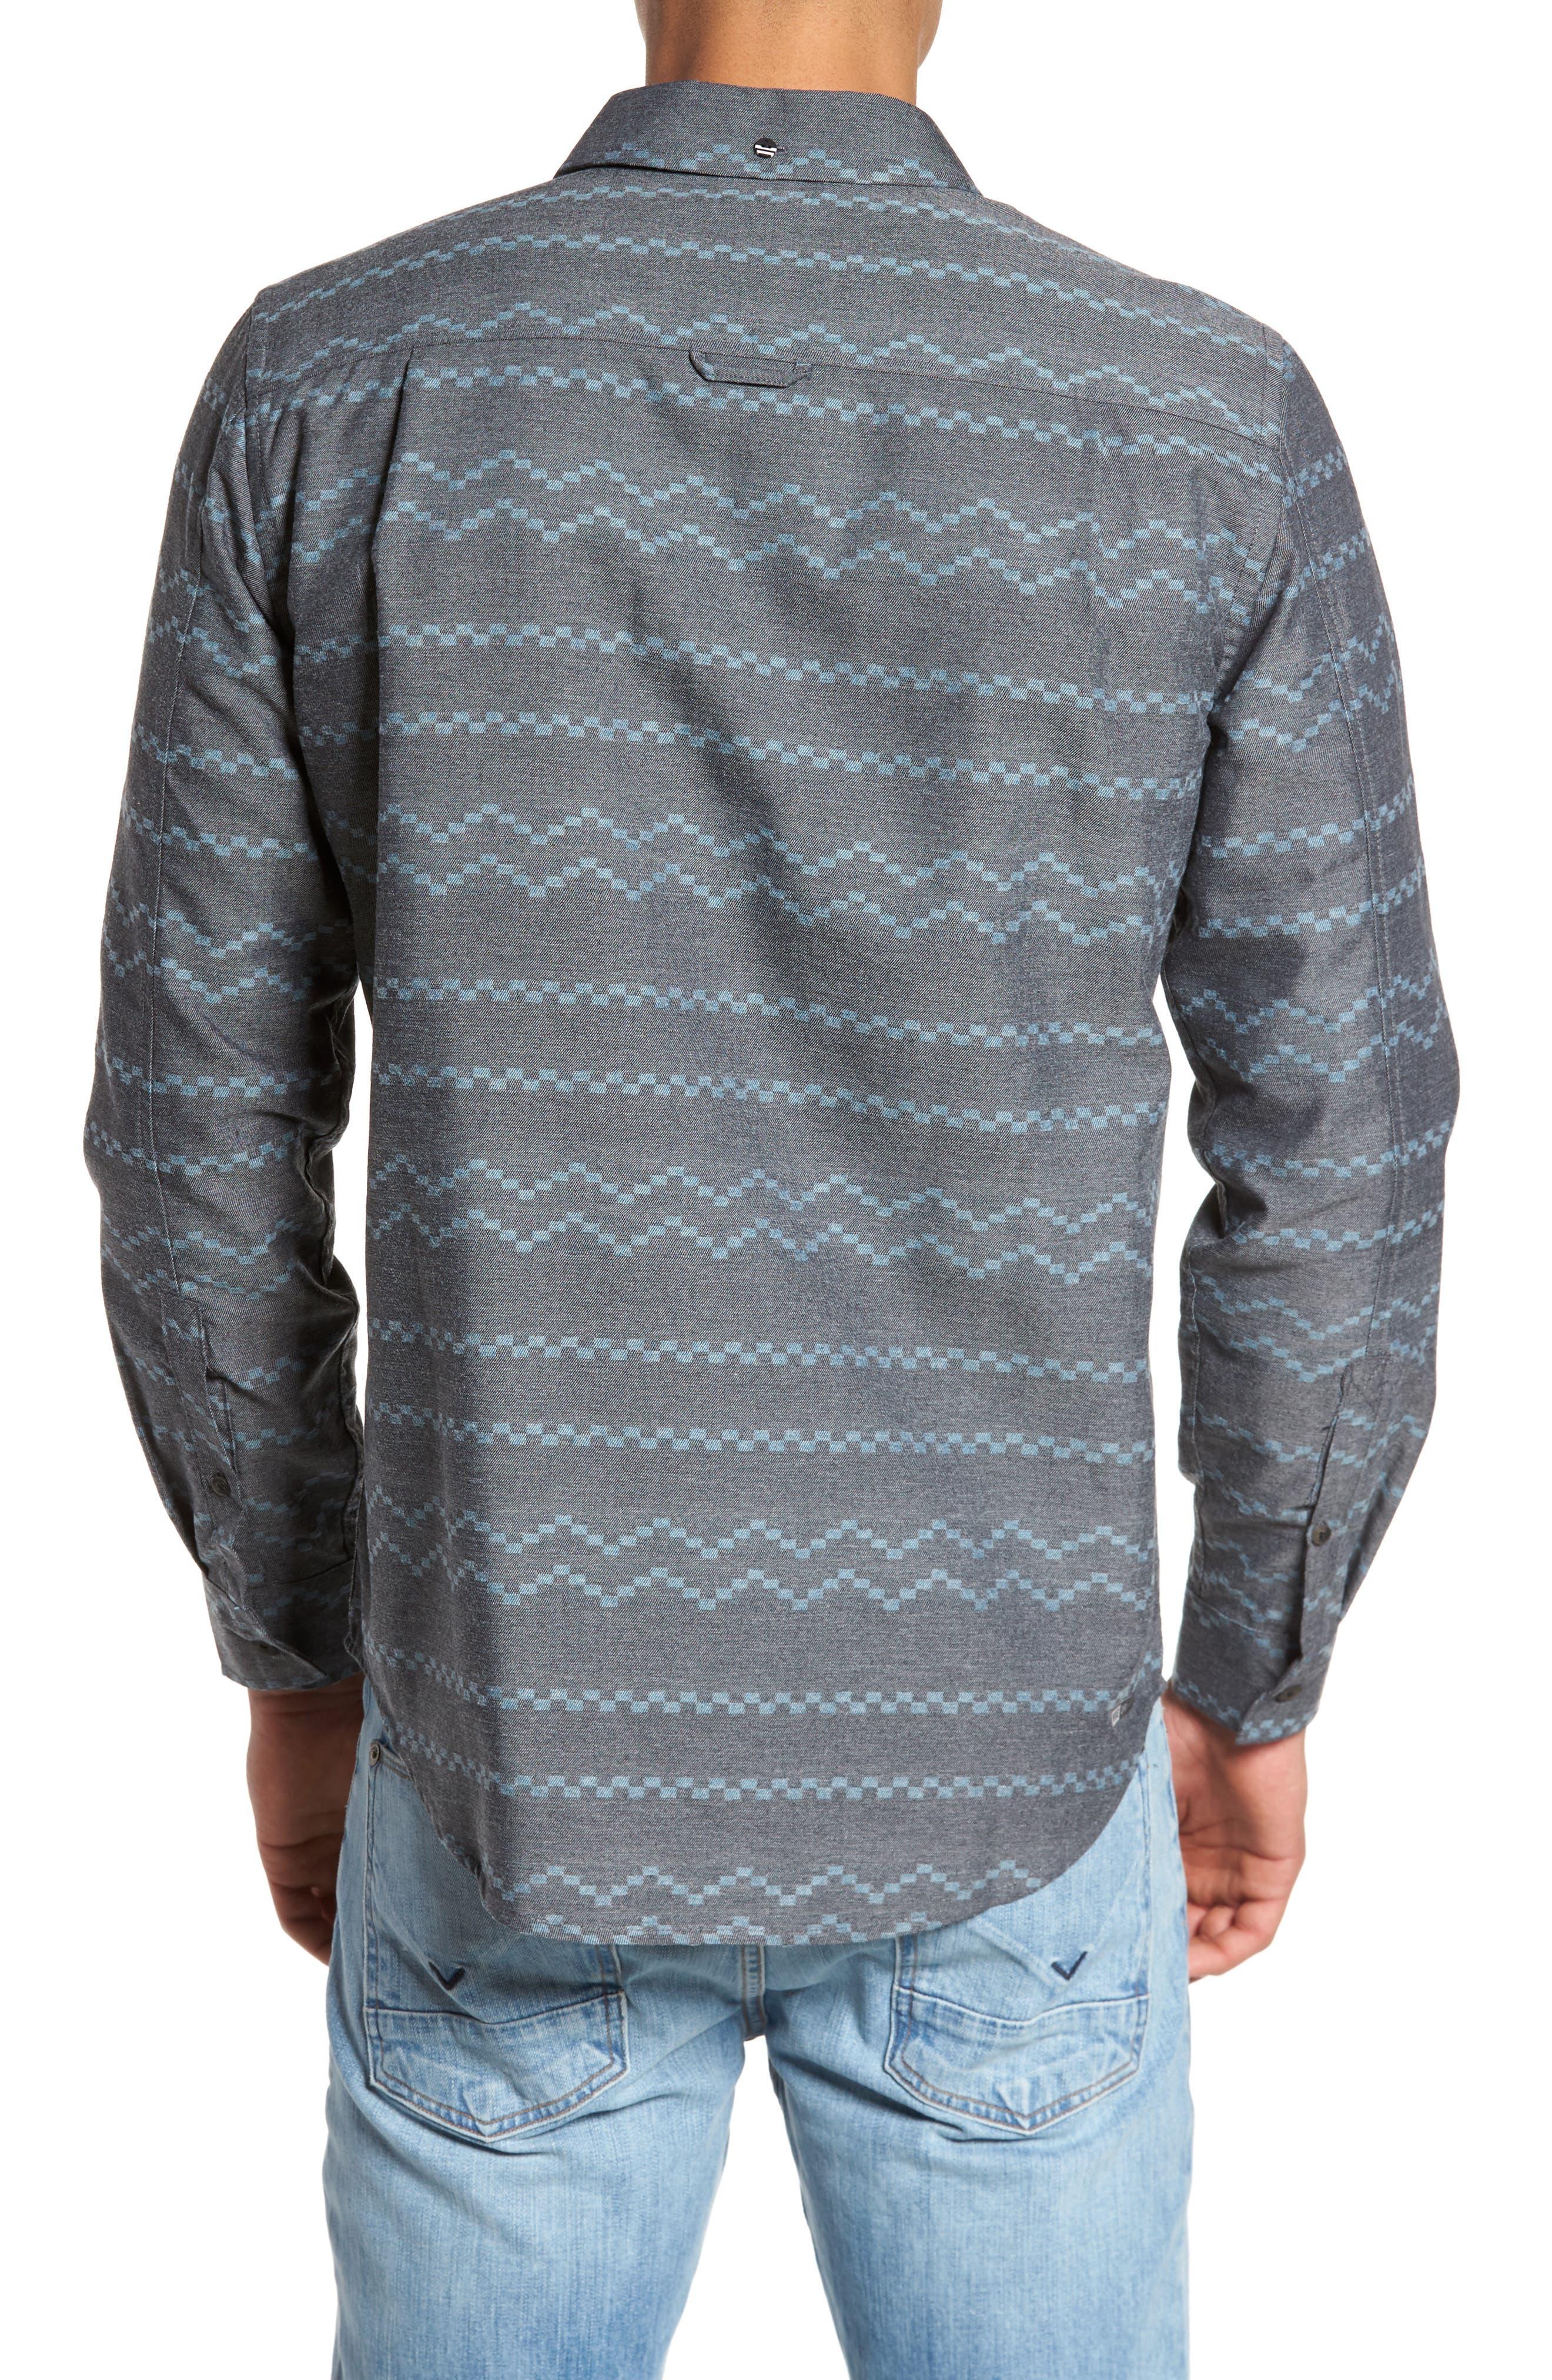 Pismo Dry Flannel Shirt,                             Alternate thumbnail 2, color,                             010